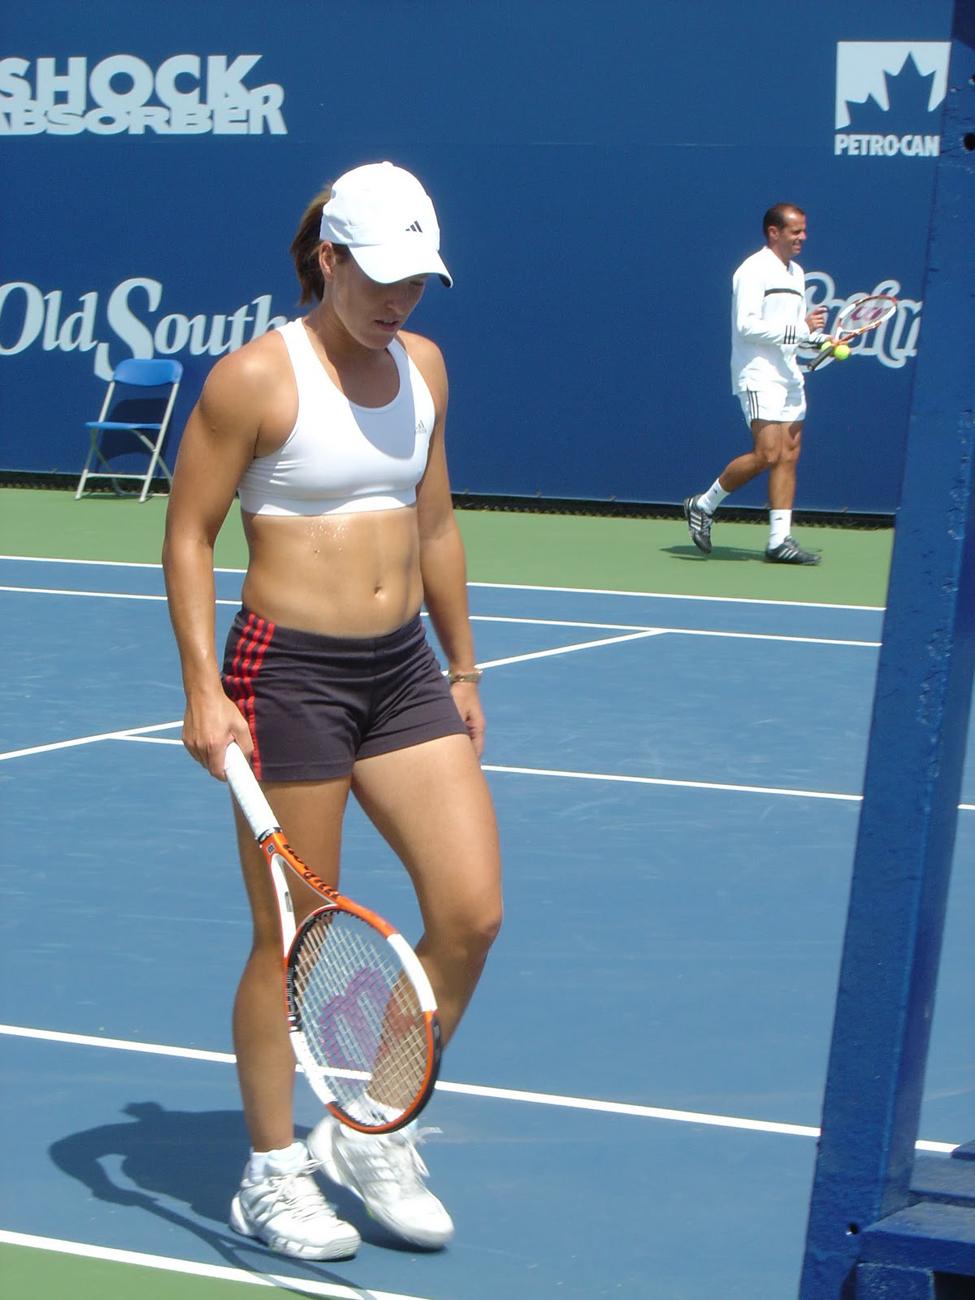 Justine Henin Fresh Hottest Tennis Player s Pic